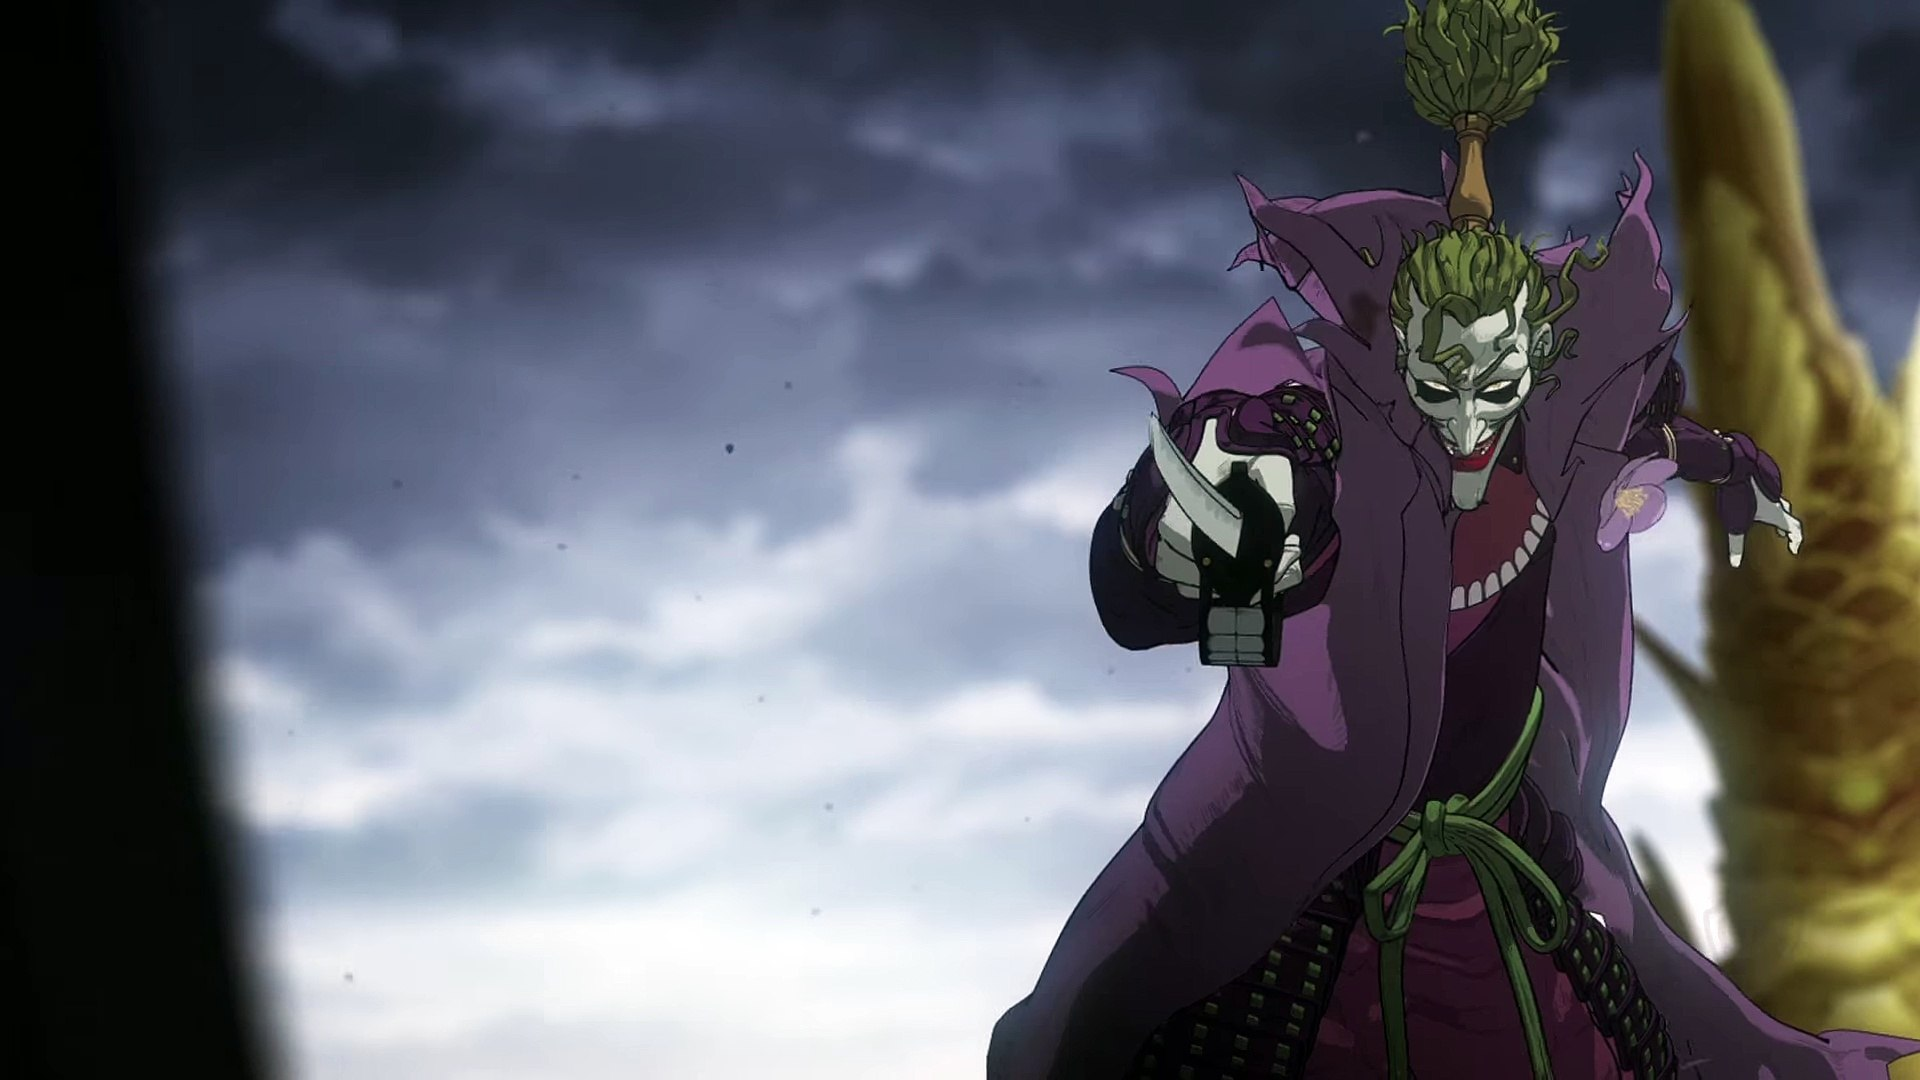 Batman Ninja Batman Vs Joker Sword Fight Video Dailymotion